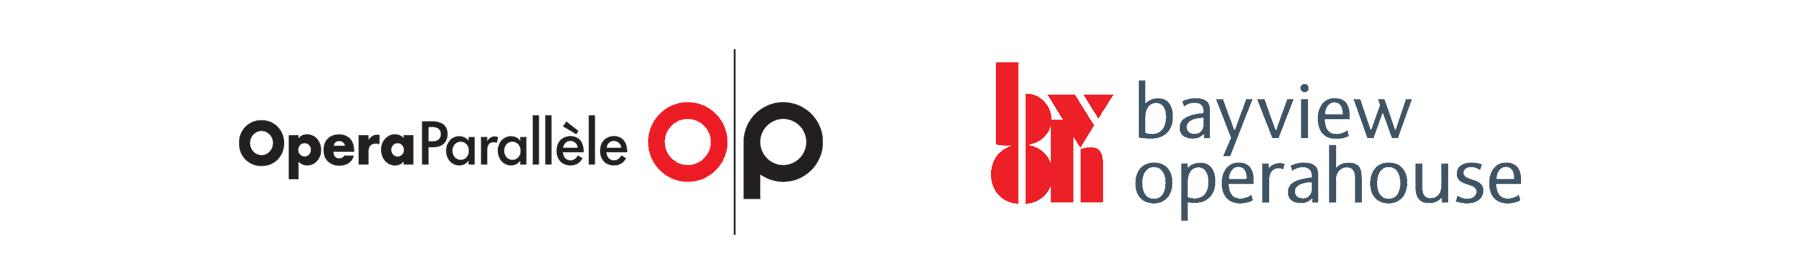 OP and BVOH header logos